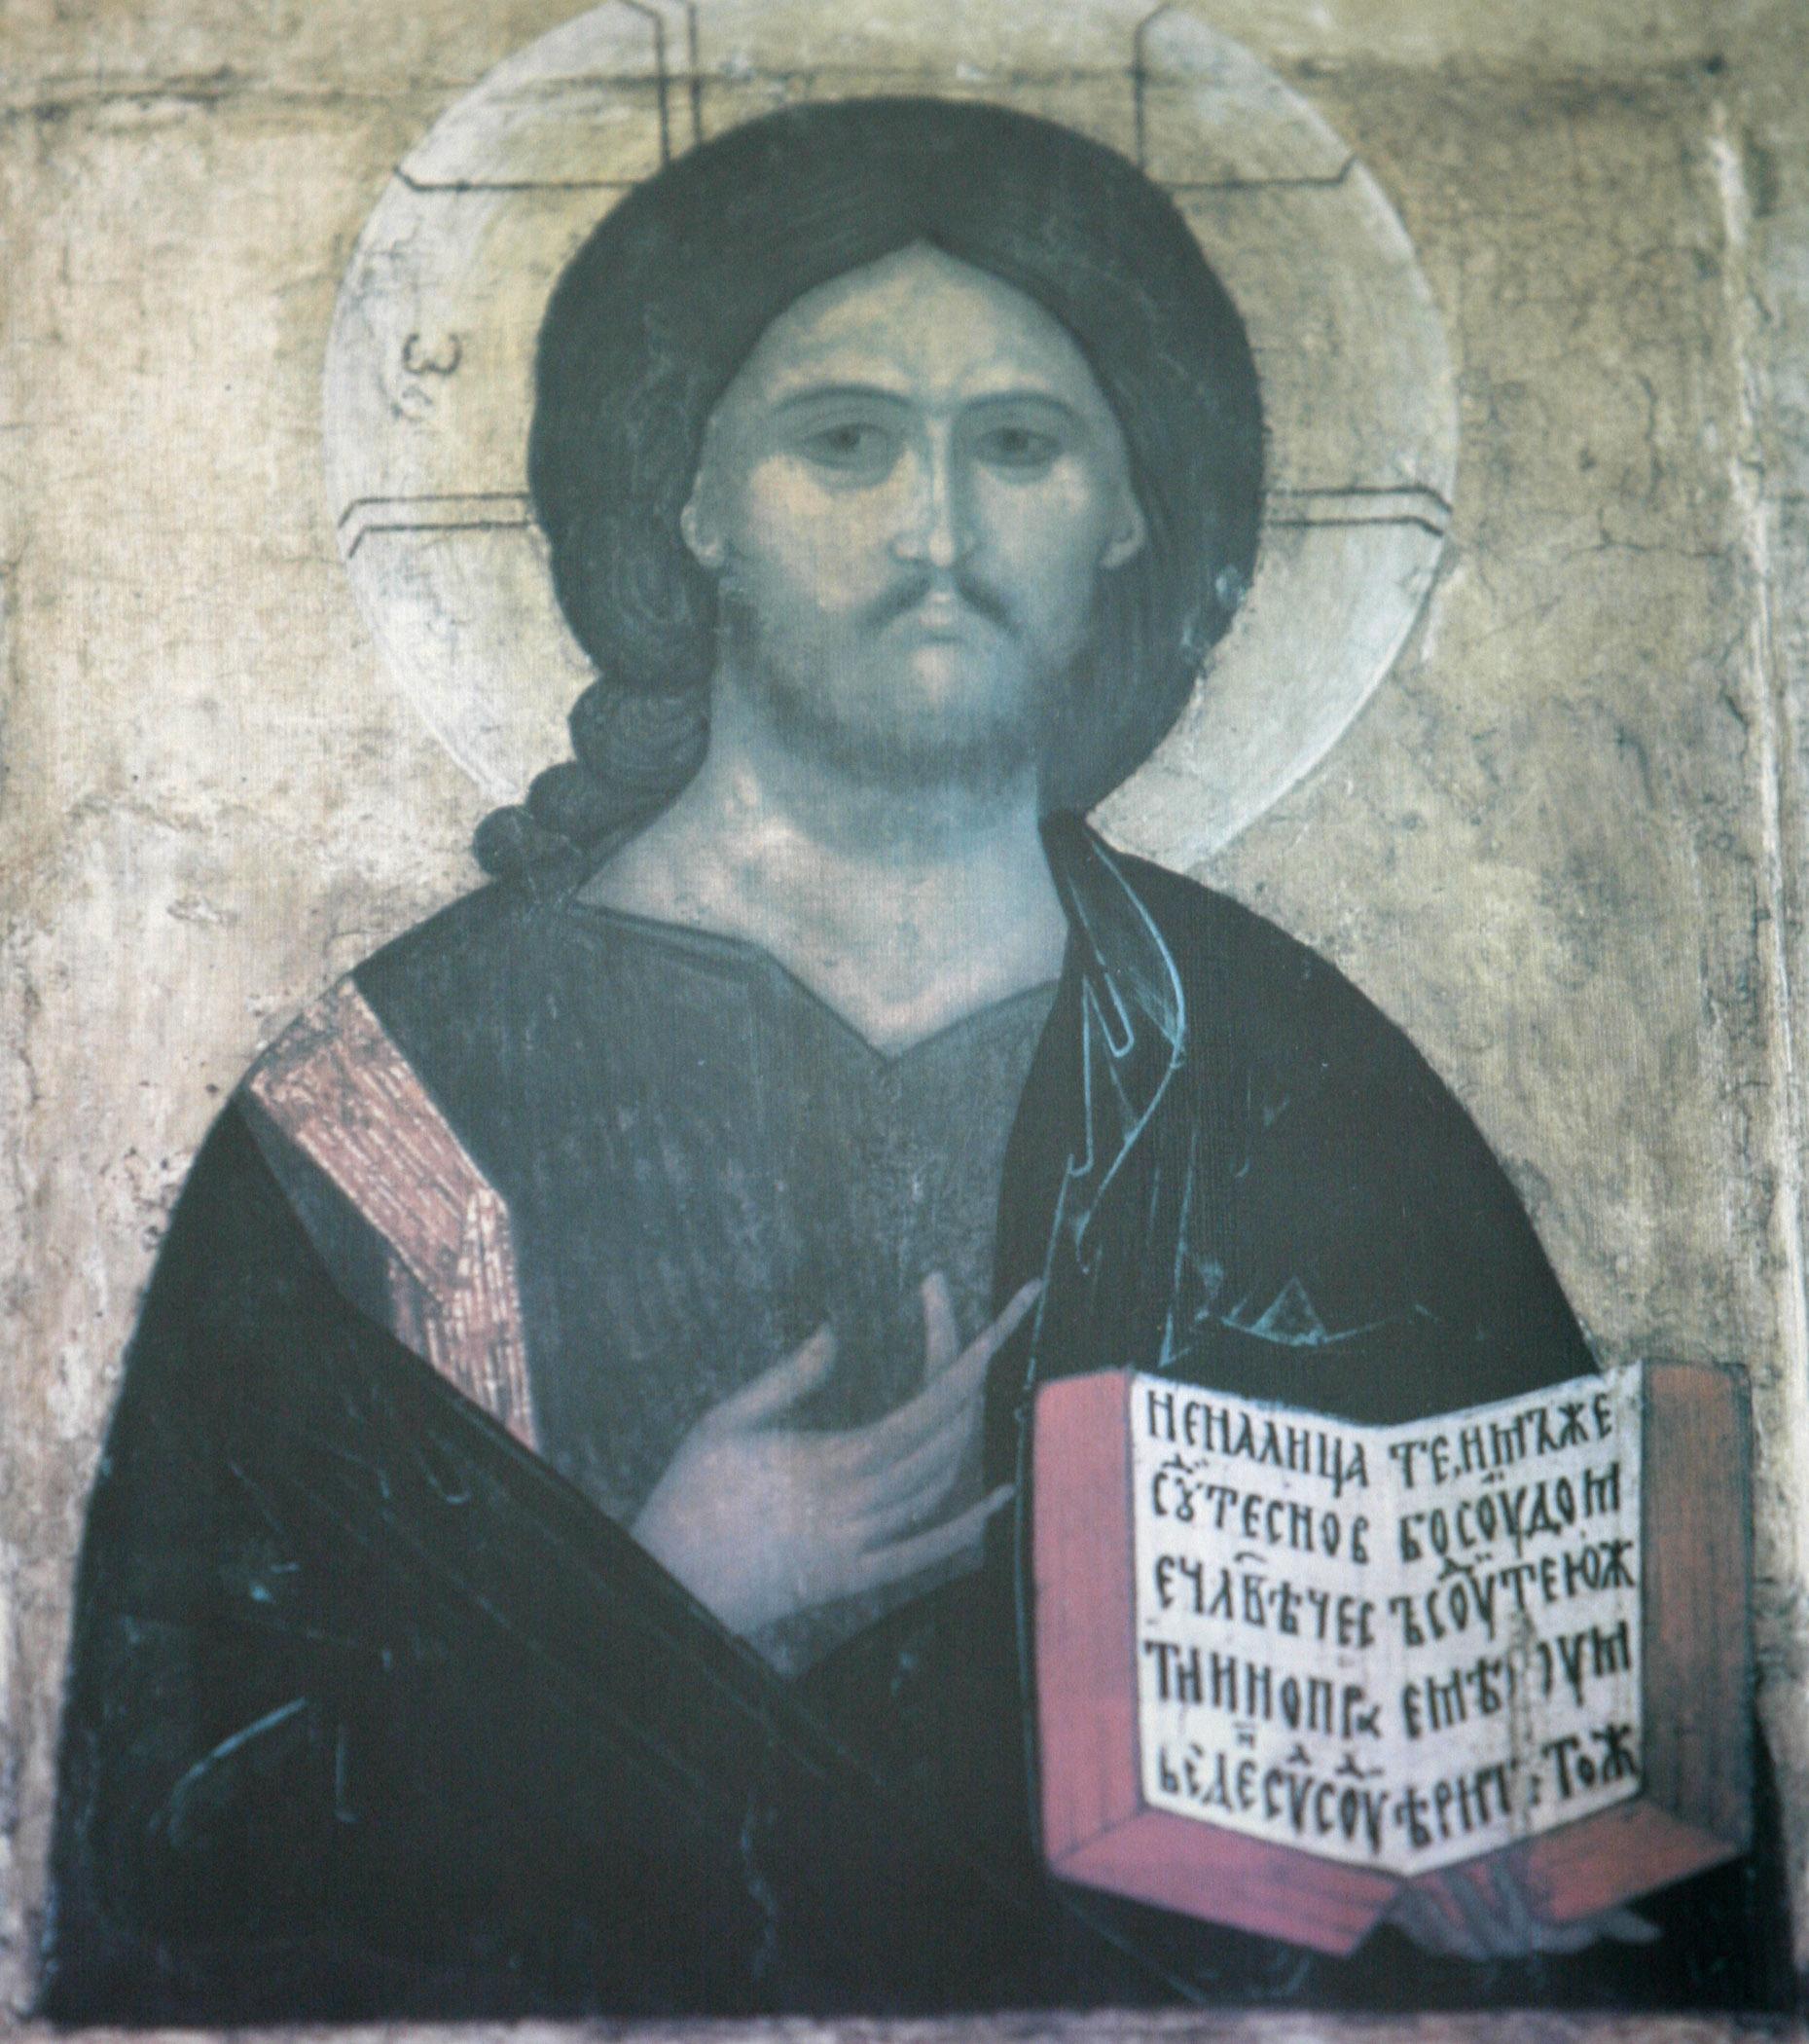 RNS JESUS COURT